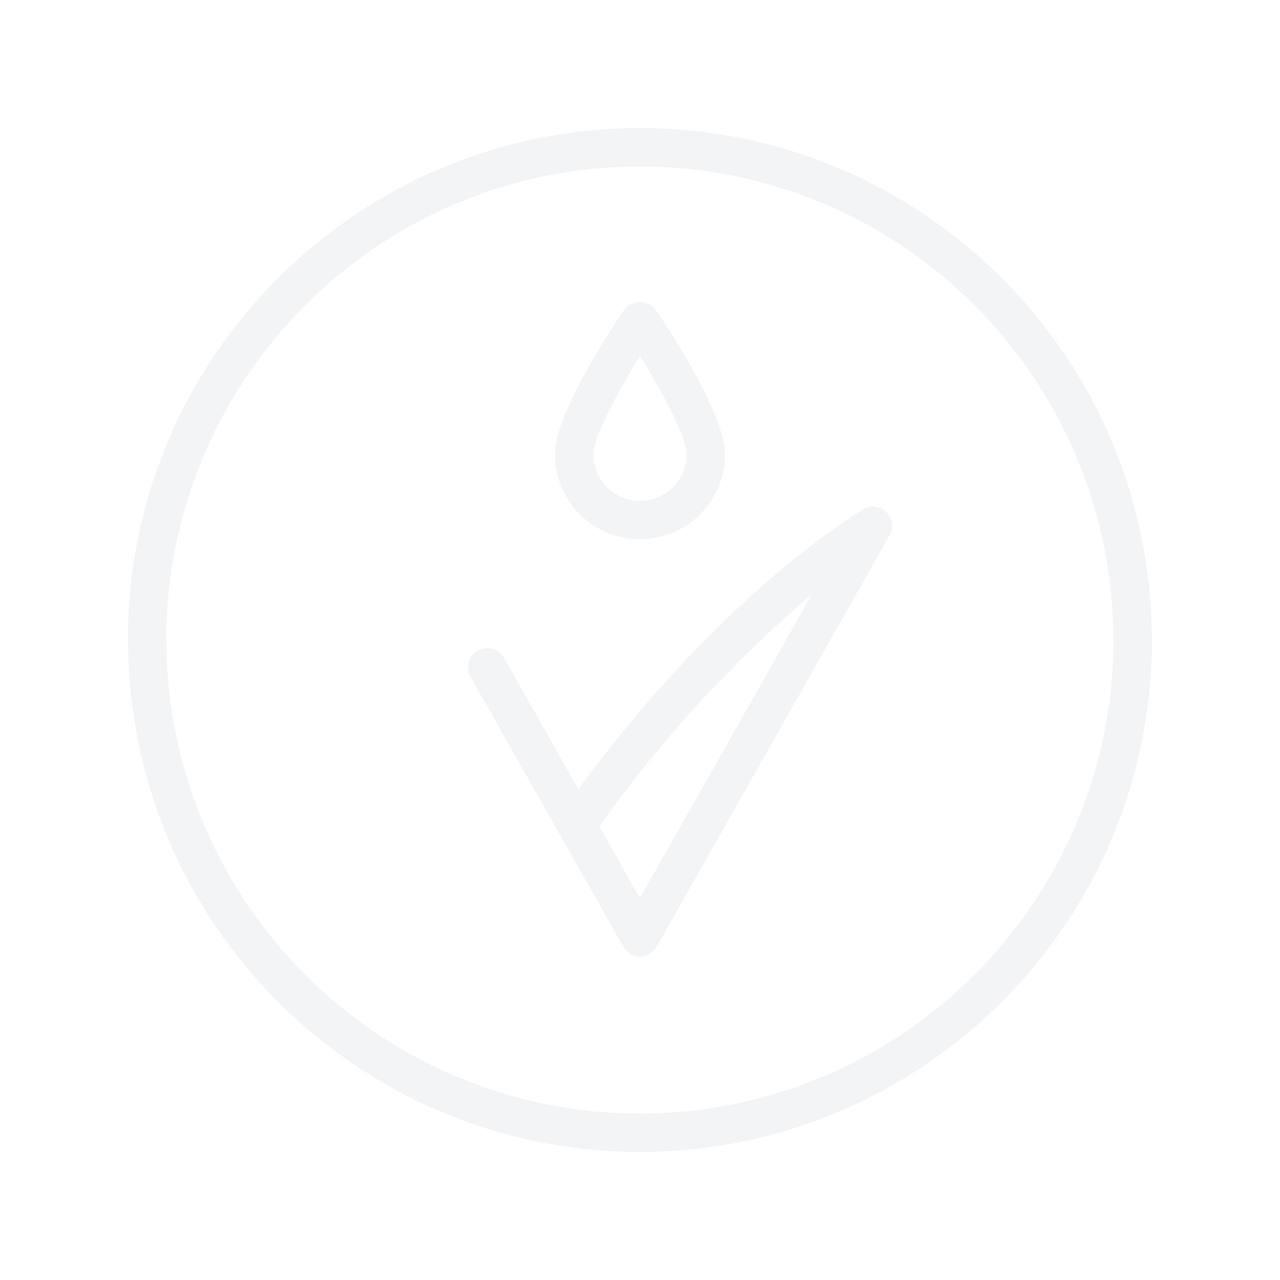 BIOKAP Nutricolor Delicato 6.06 Permanent Hair Dye 140ml